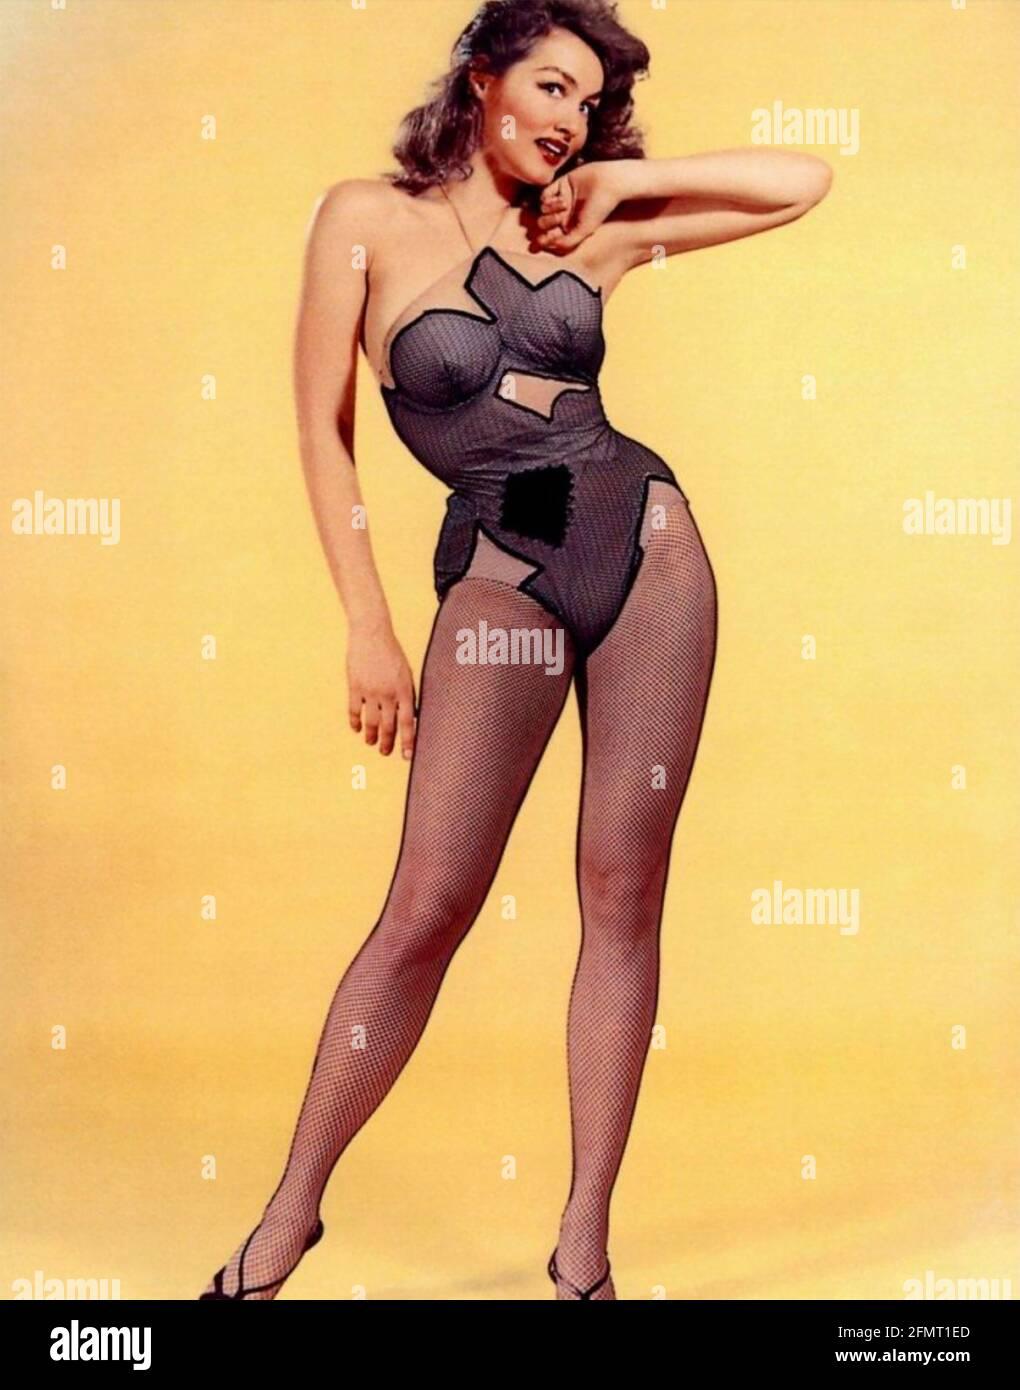 LI'L ABNER 1959 Paramount Picturfilm mit Julie Newmar als Stupefyin' Jones. Foto: Graphic House Stockfoto